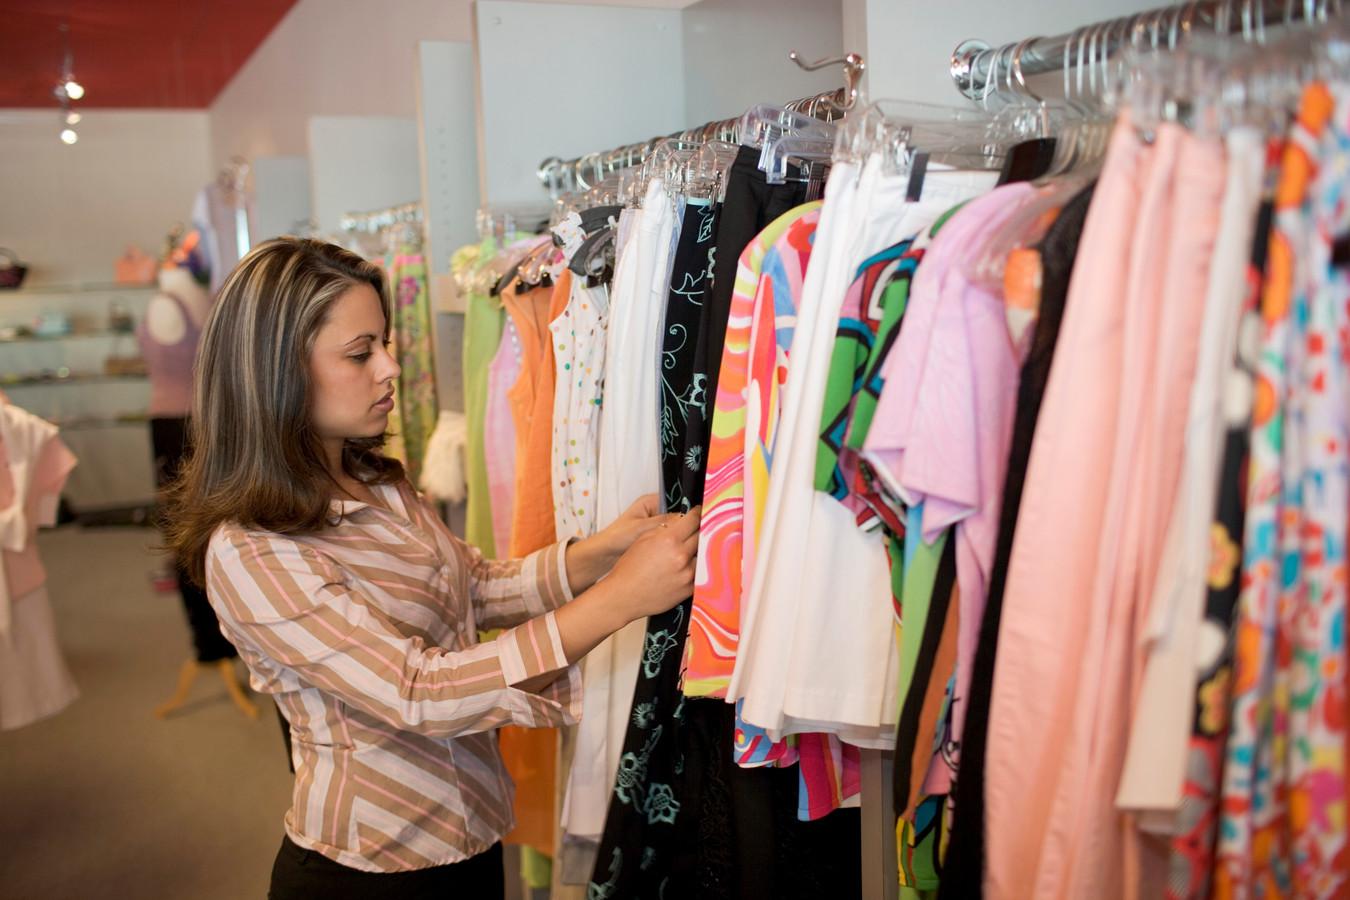 Kledingzaak winkel kleding